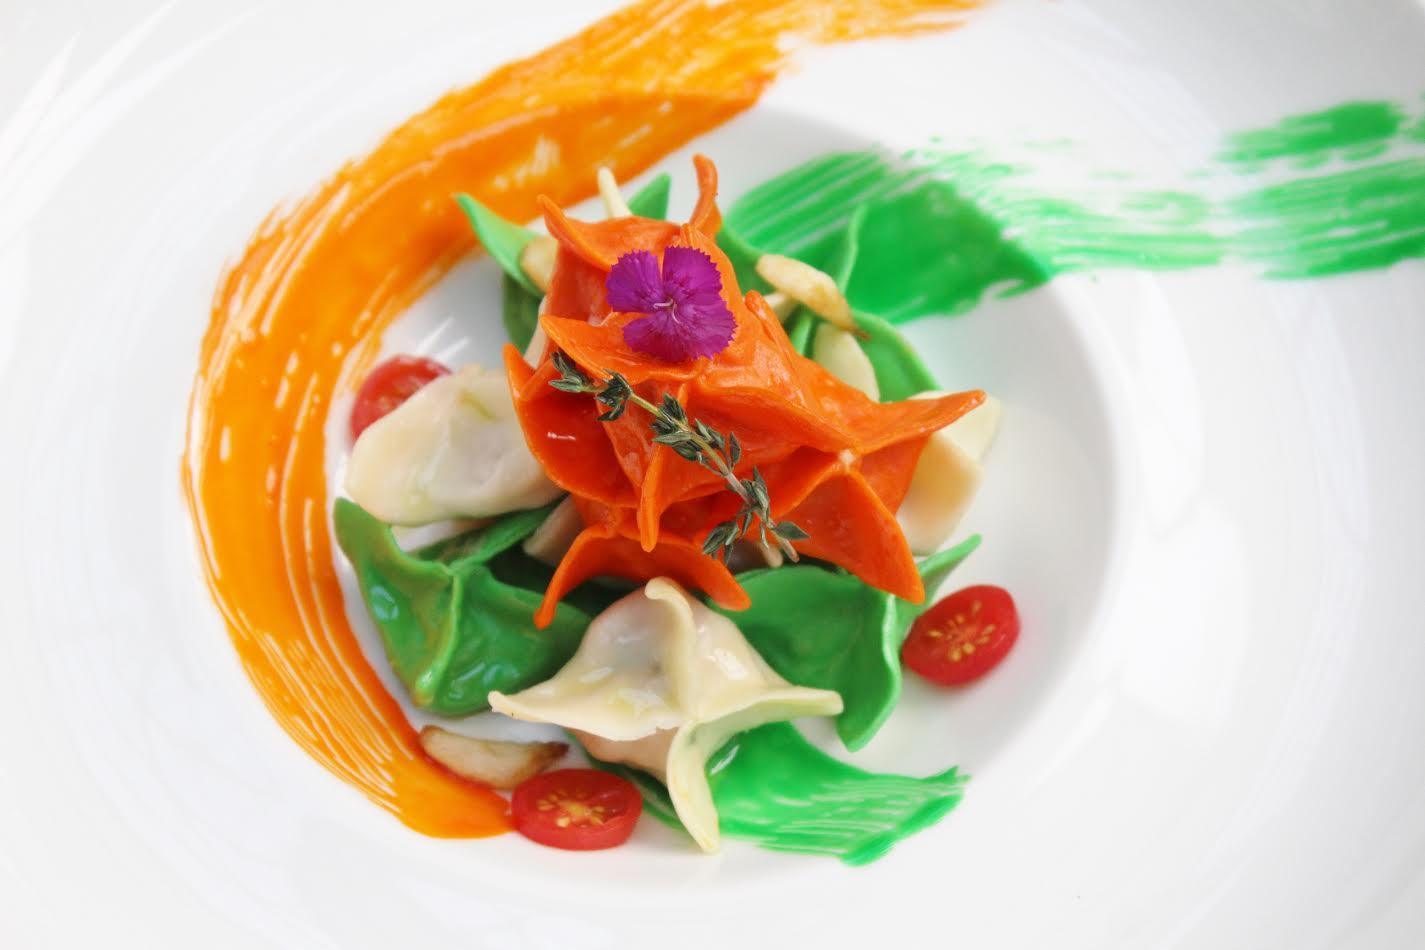 Independence Day Recipe - Stuffed Ravioli by Chef Rajan Rajani, Executive Chef, Hotel Sahara Star